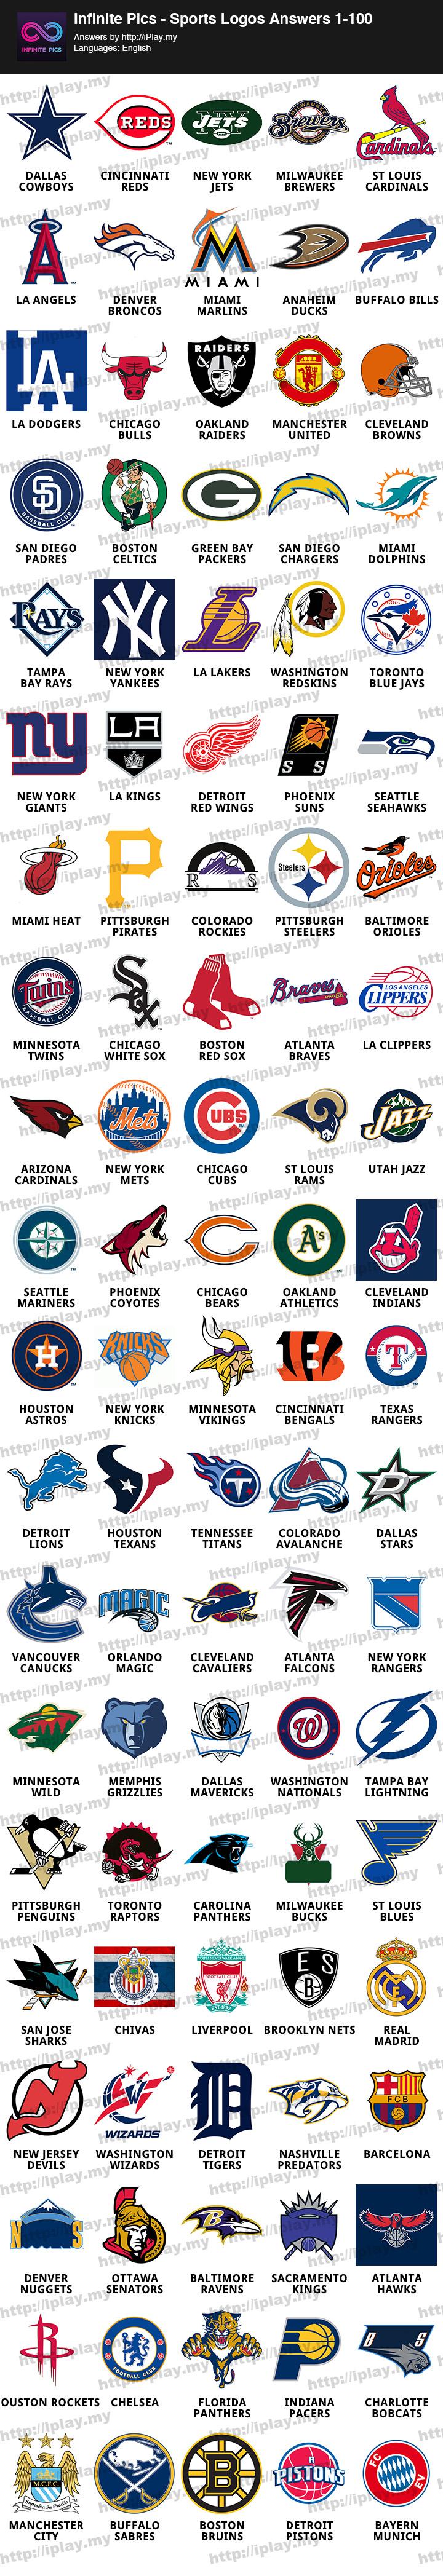 infinite pics � sports logos answers iplaymy